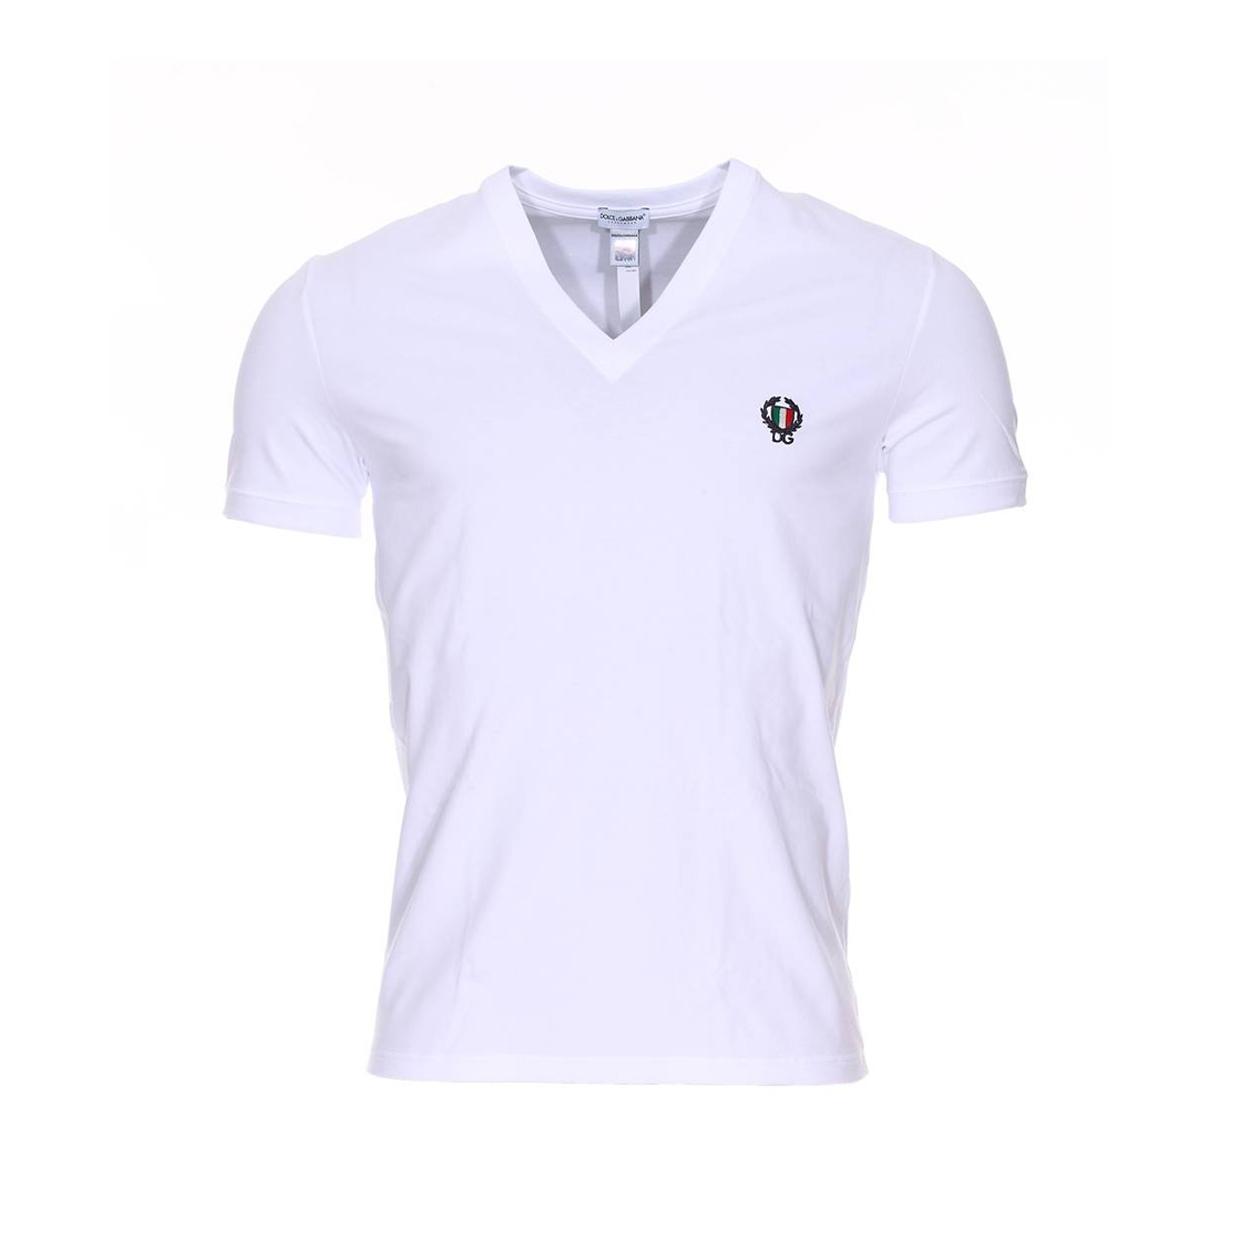 Tee-shirt col v  en coton stretch blanc brodé à la poitrine